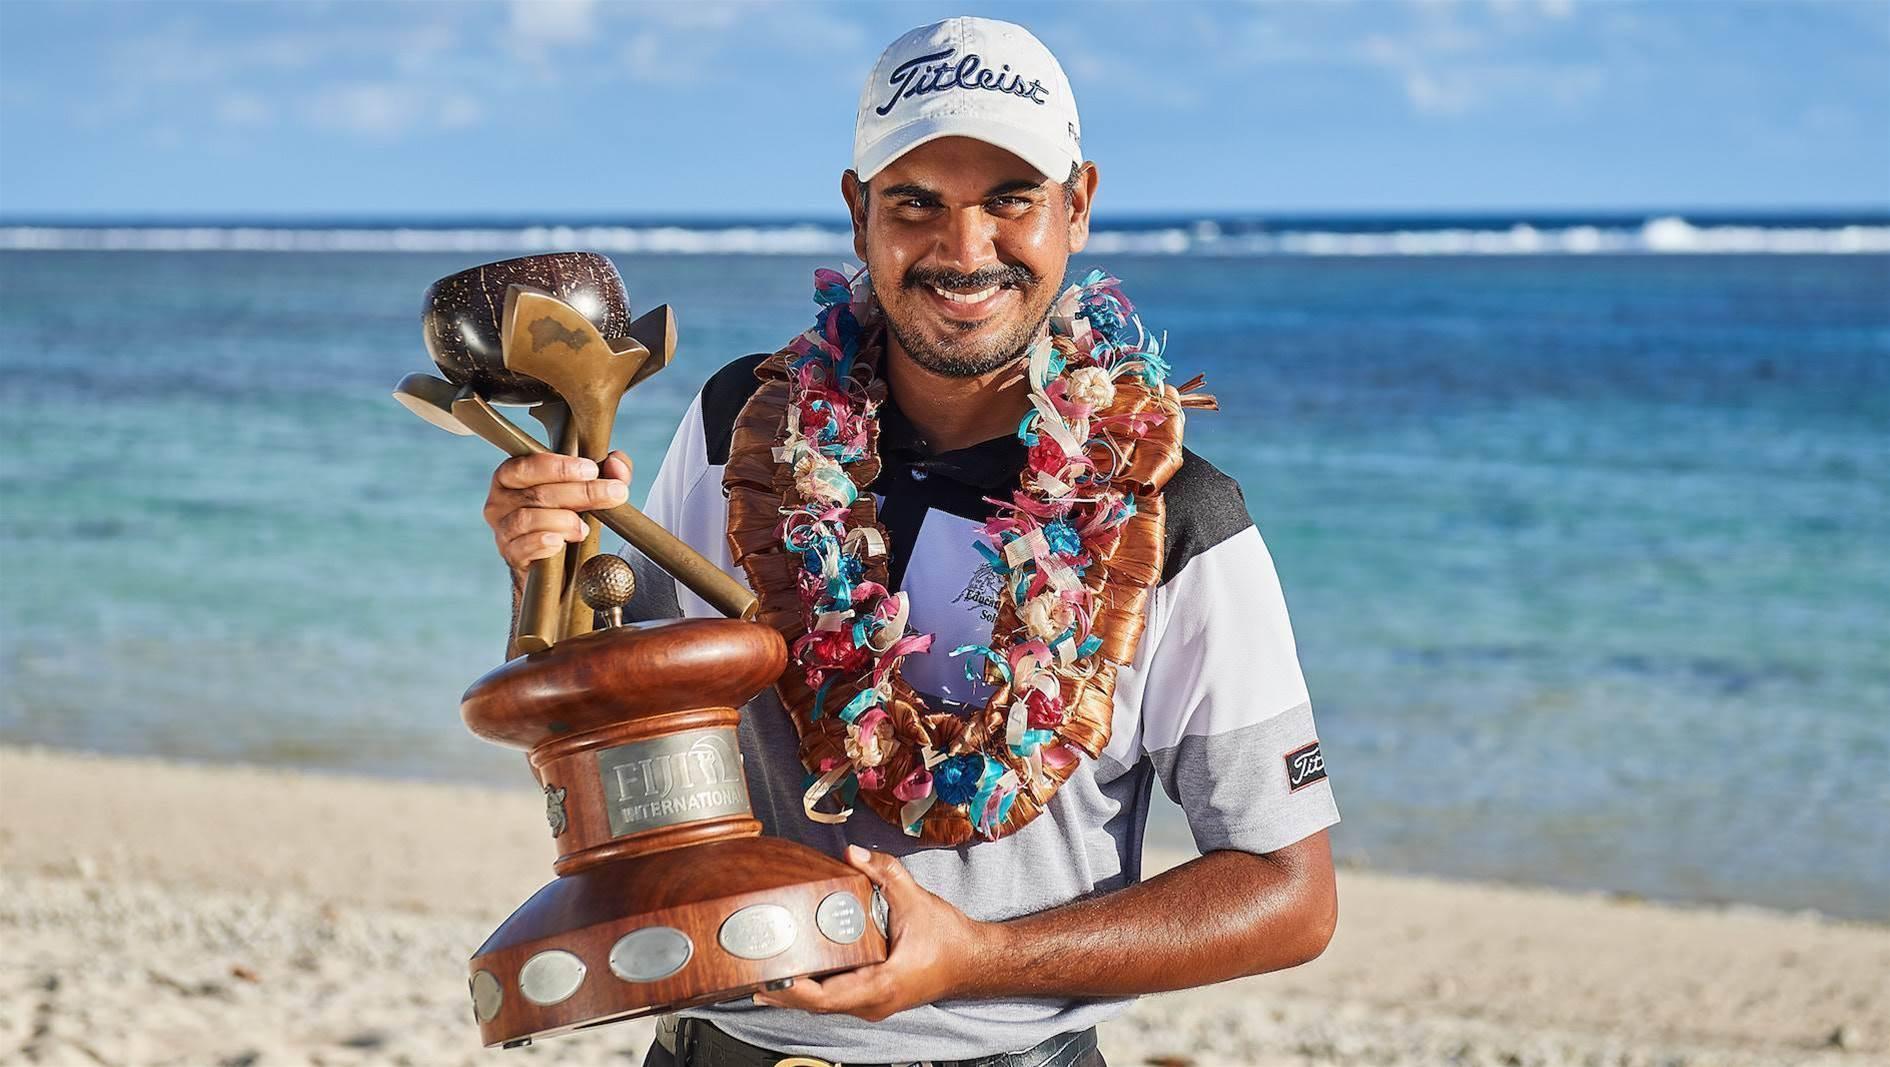 Gaganjeet Bhullar wins the 2018 Fiji International